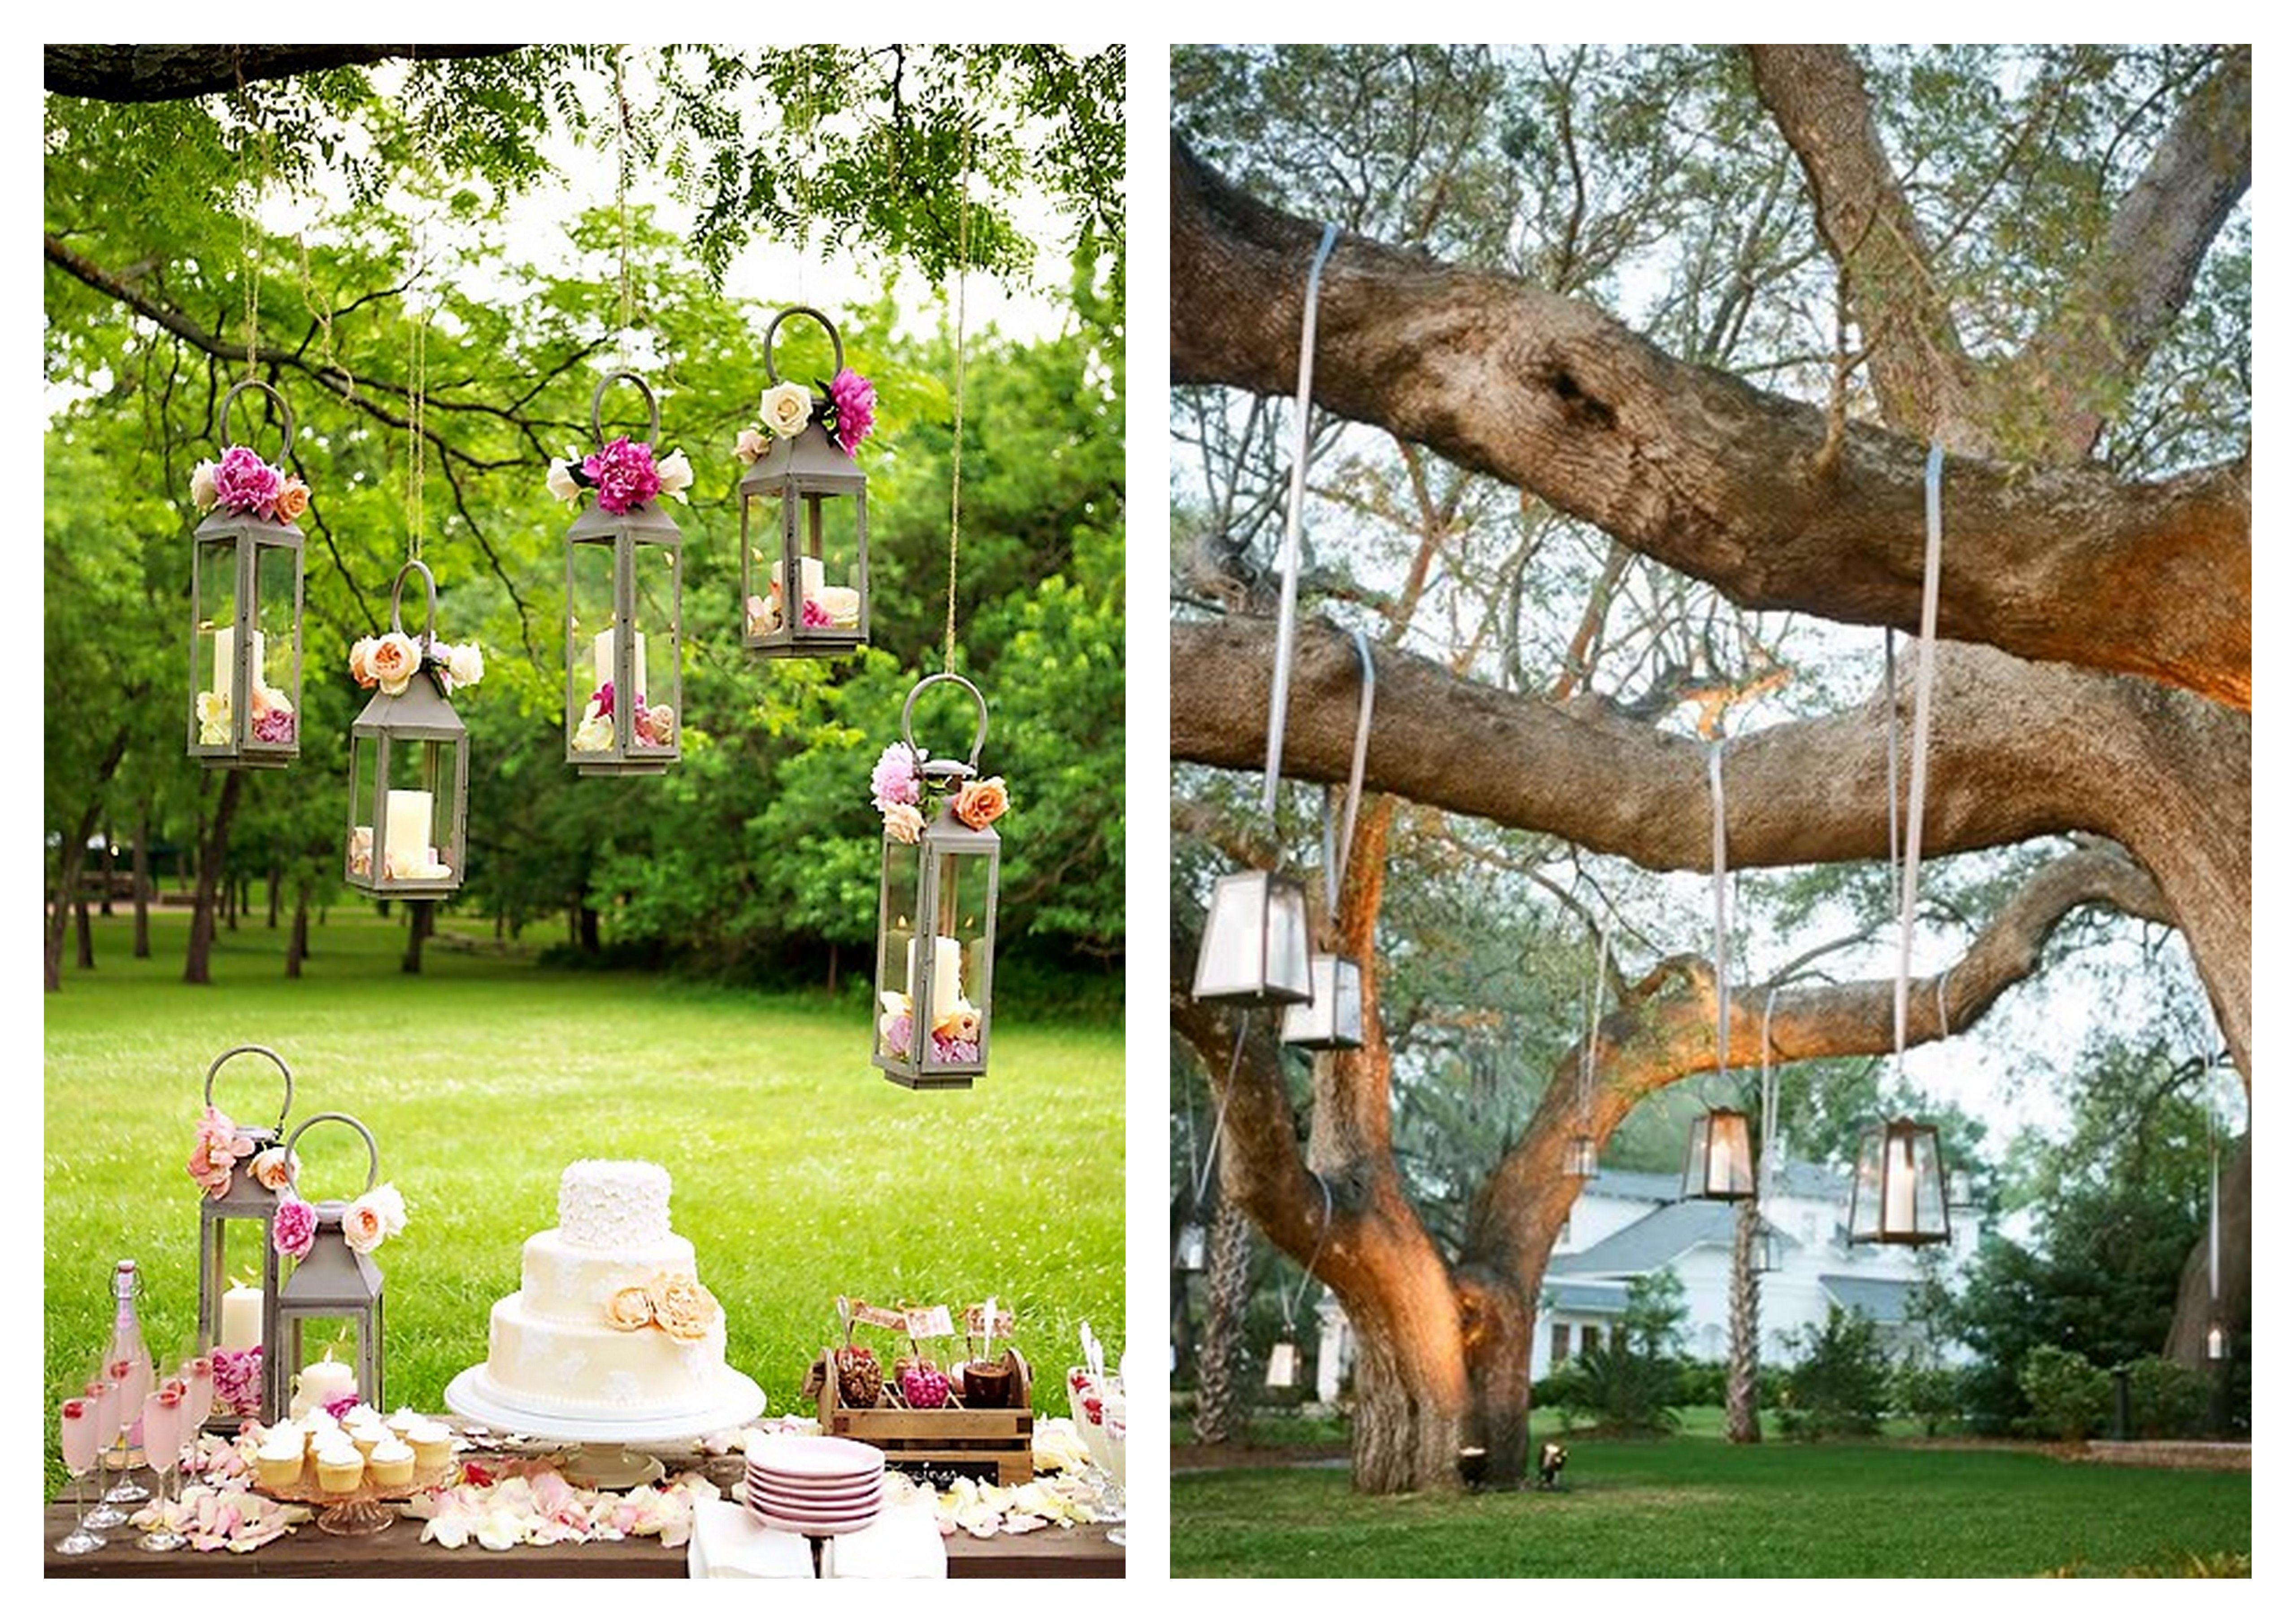 Amazing Garden Wedding Decor Ideas Pictures Inspiration - Beautiful ...